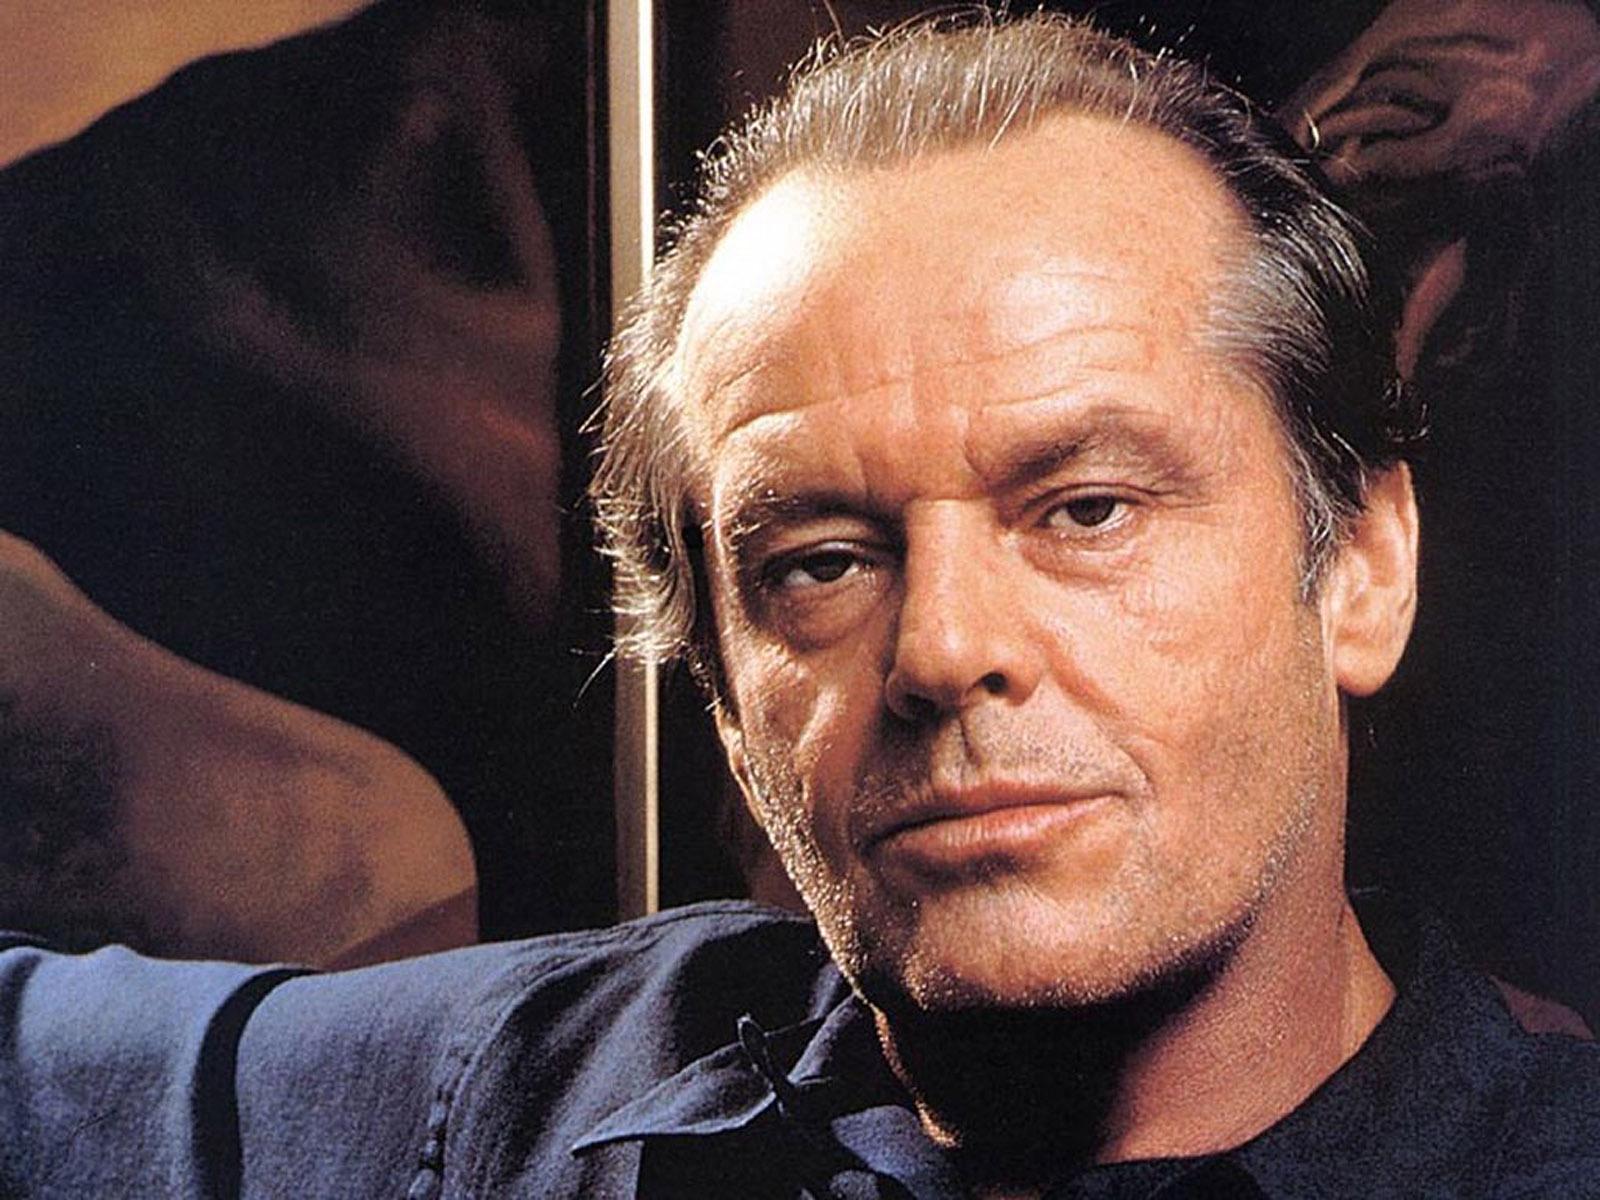 Jack Nicholson Image WallpapersJack Nicholson Wallpapers 1600x1200